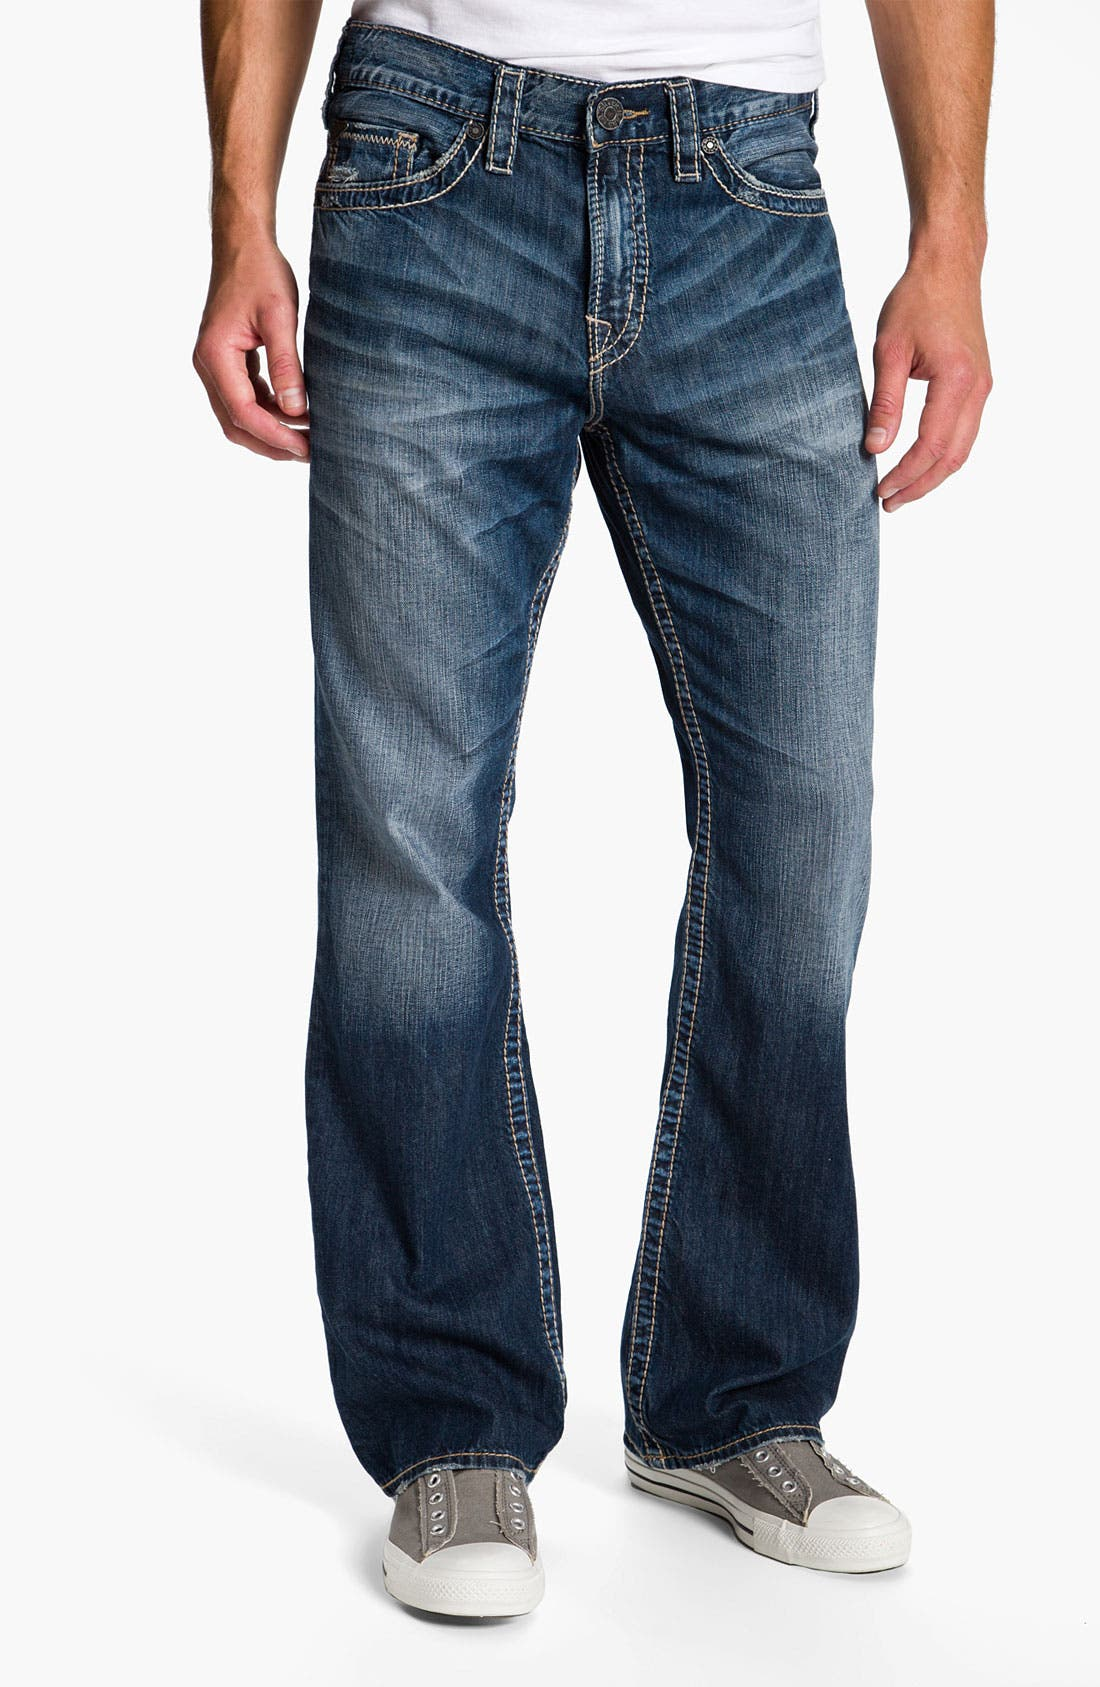 Alternate Image 2  - Silver Jeans Co. 'Grayson' Bootcut Jeans (Indigo)